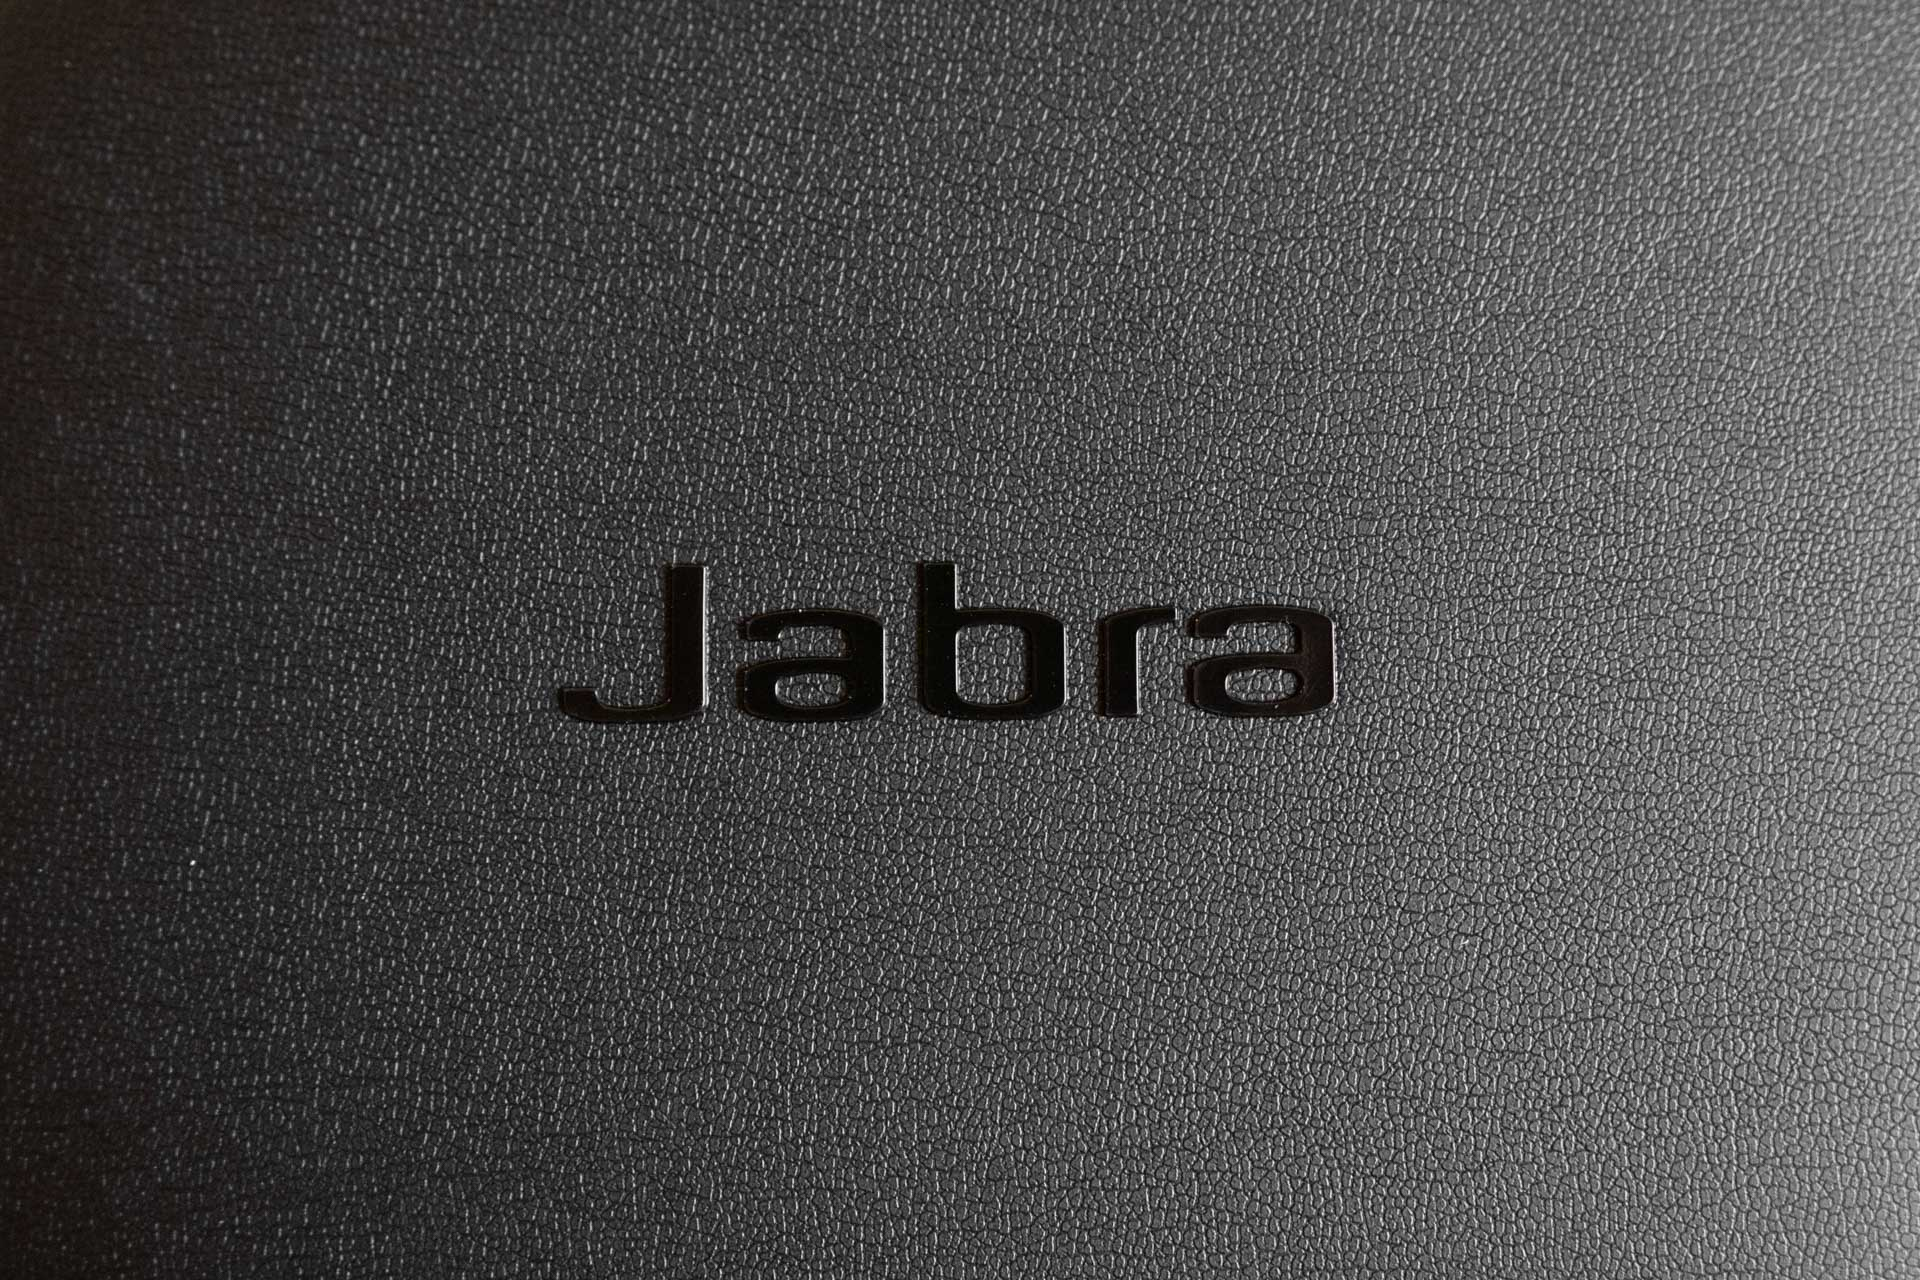 BPP 09 - Jabra Elite 85h Packaging IG-10.jpg